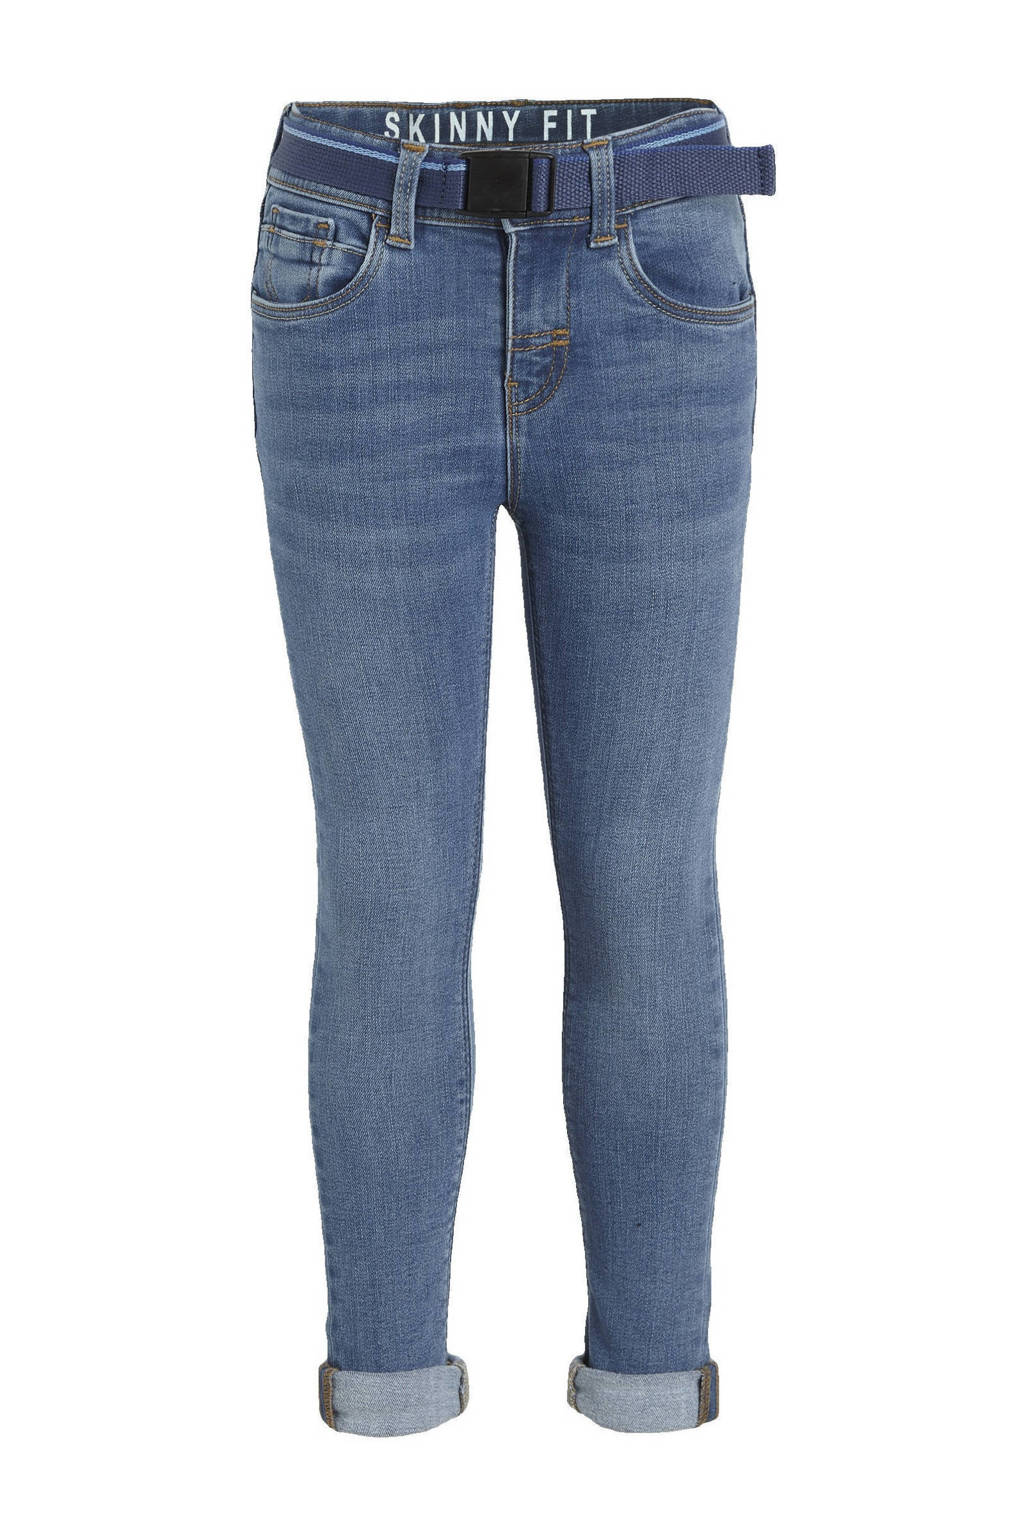 C&A Palomino skinny jeans blauw, Blauw